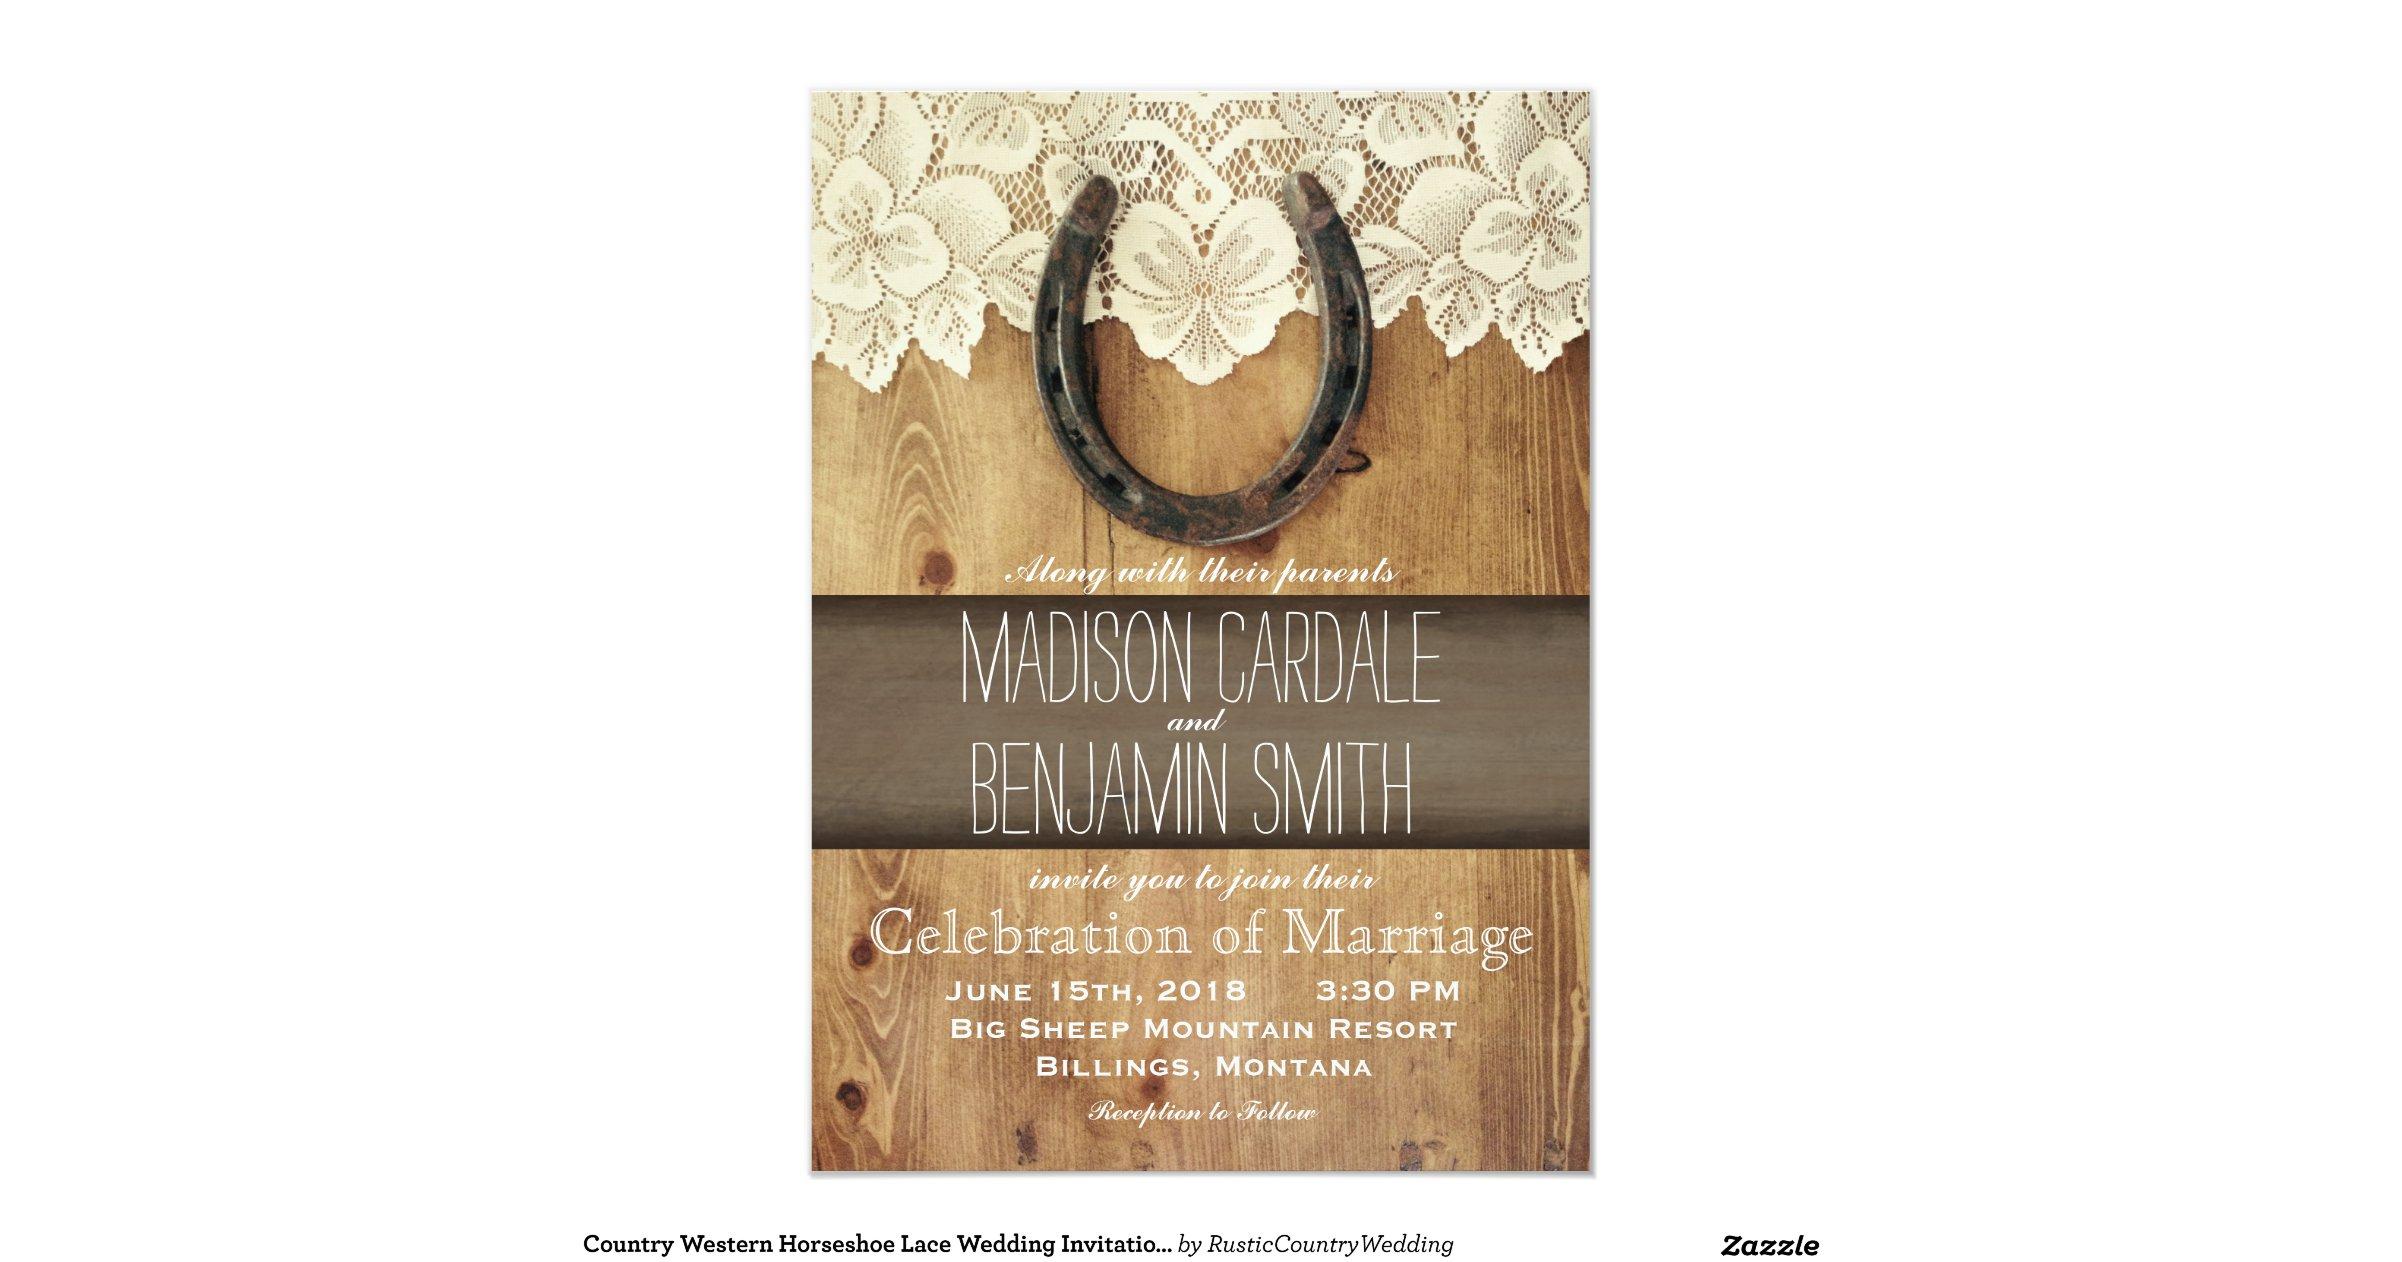 Country Western Horseshoe Lace Wedding Invitations Ra9fcdb6f2bba4cb28c8162032b01ca6c Zk9li 1200